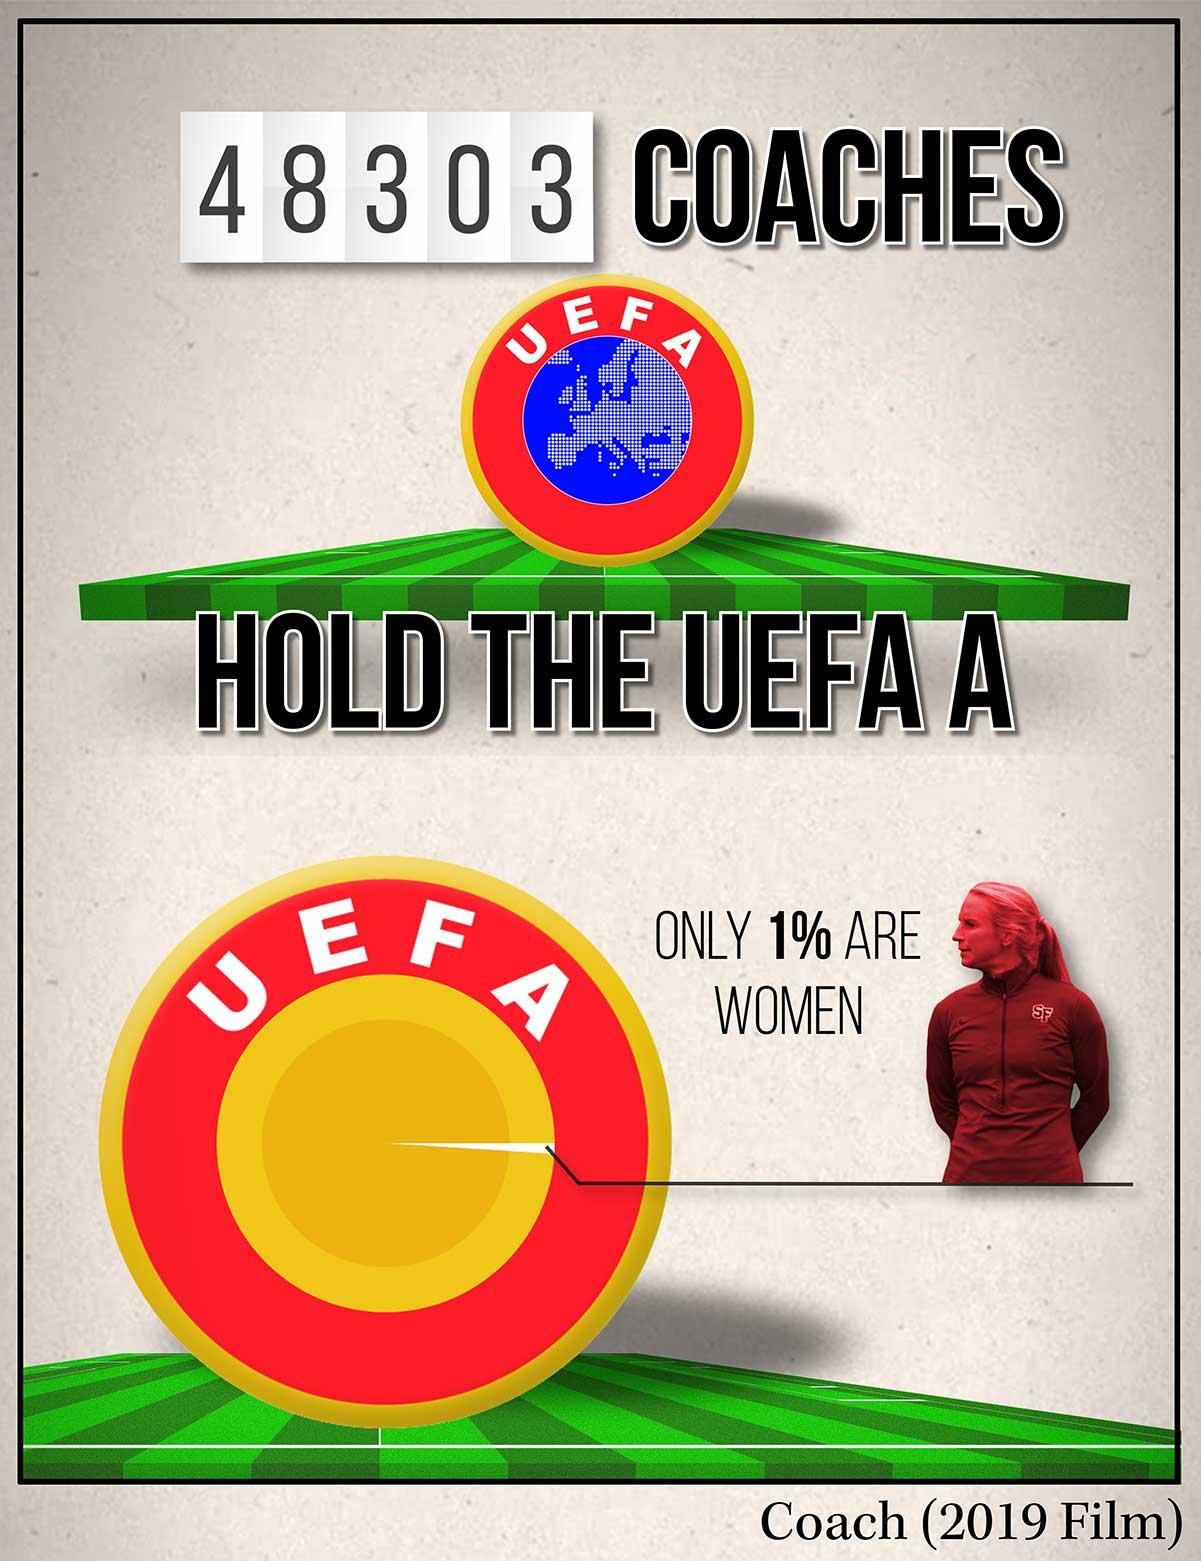 uefa womens coaches